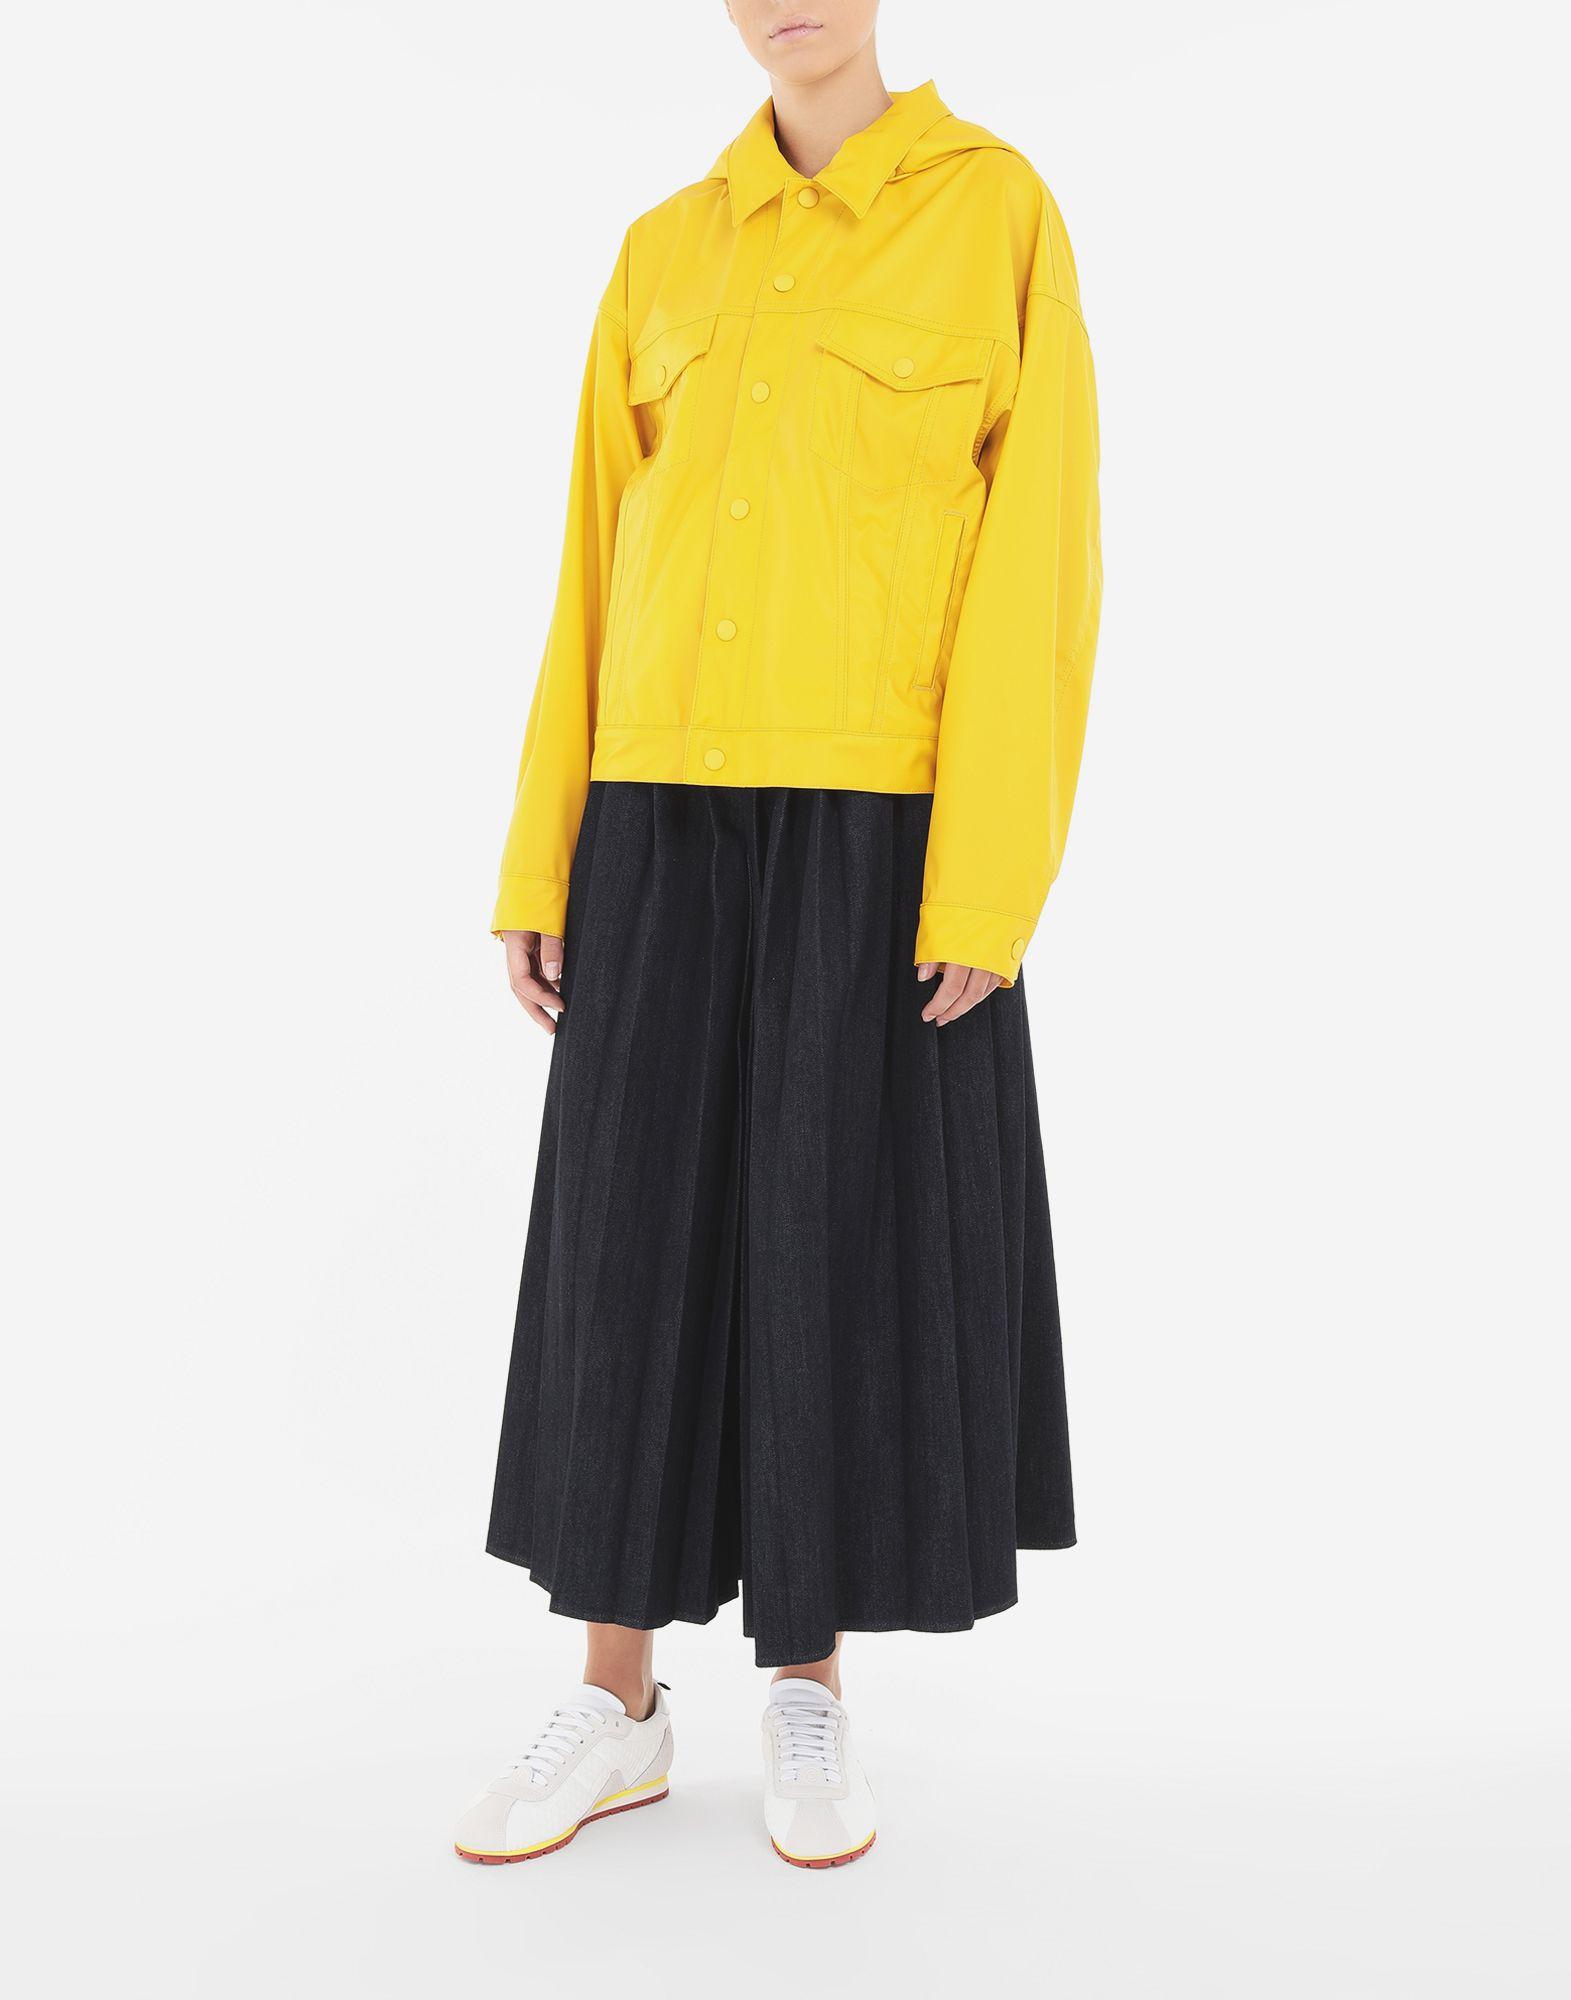 MM6 MAISON MARGIELA Pleated denim trousers Trousers Woman d